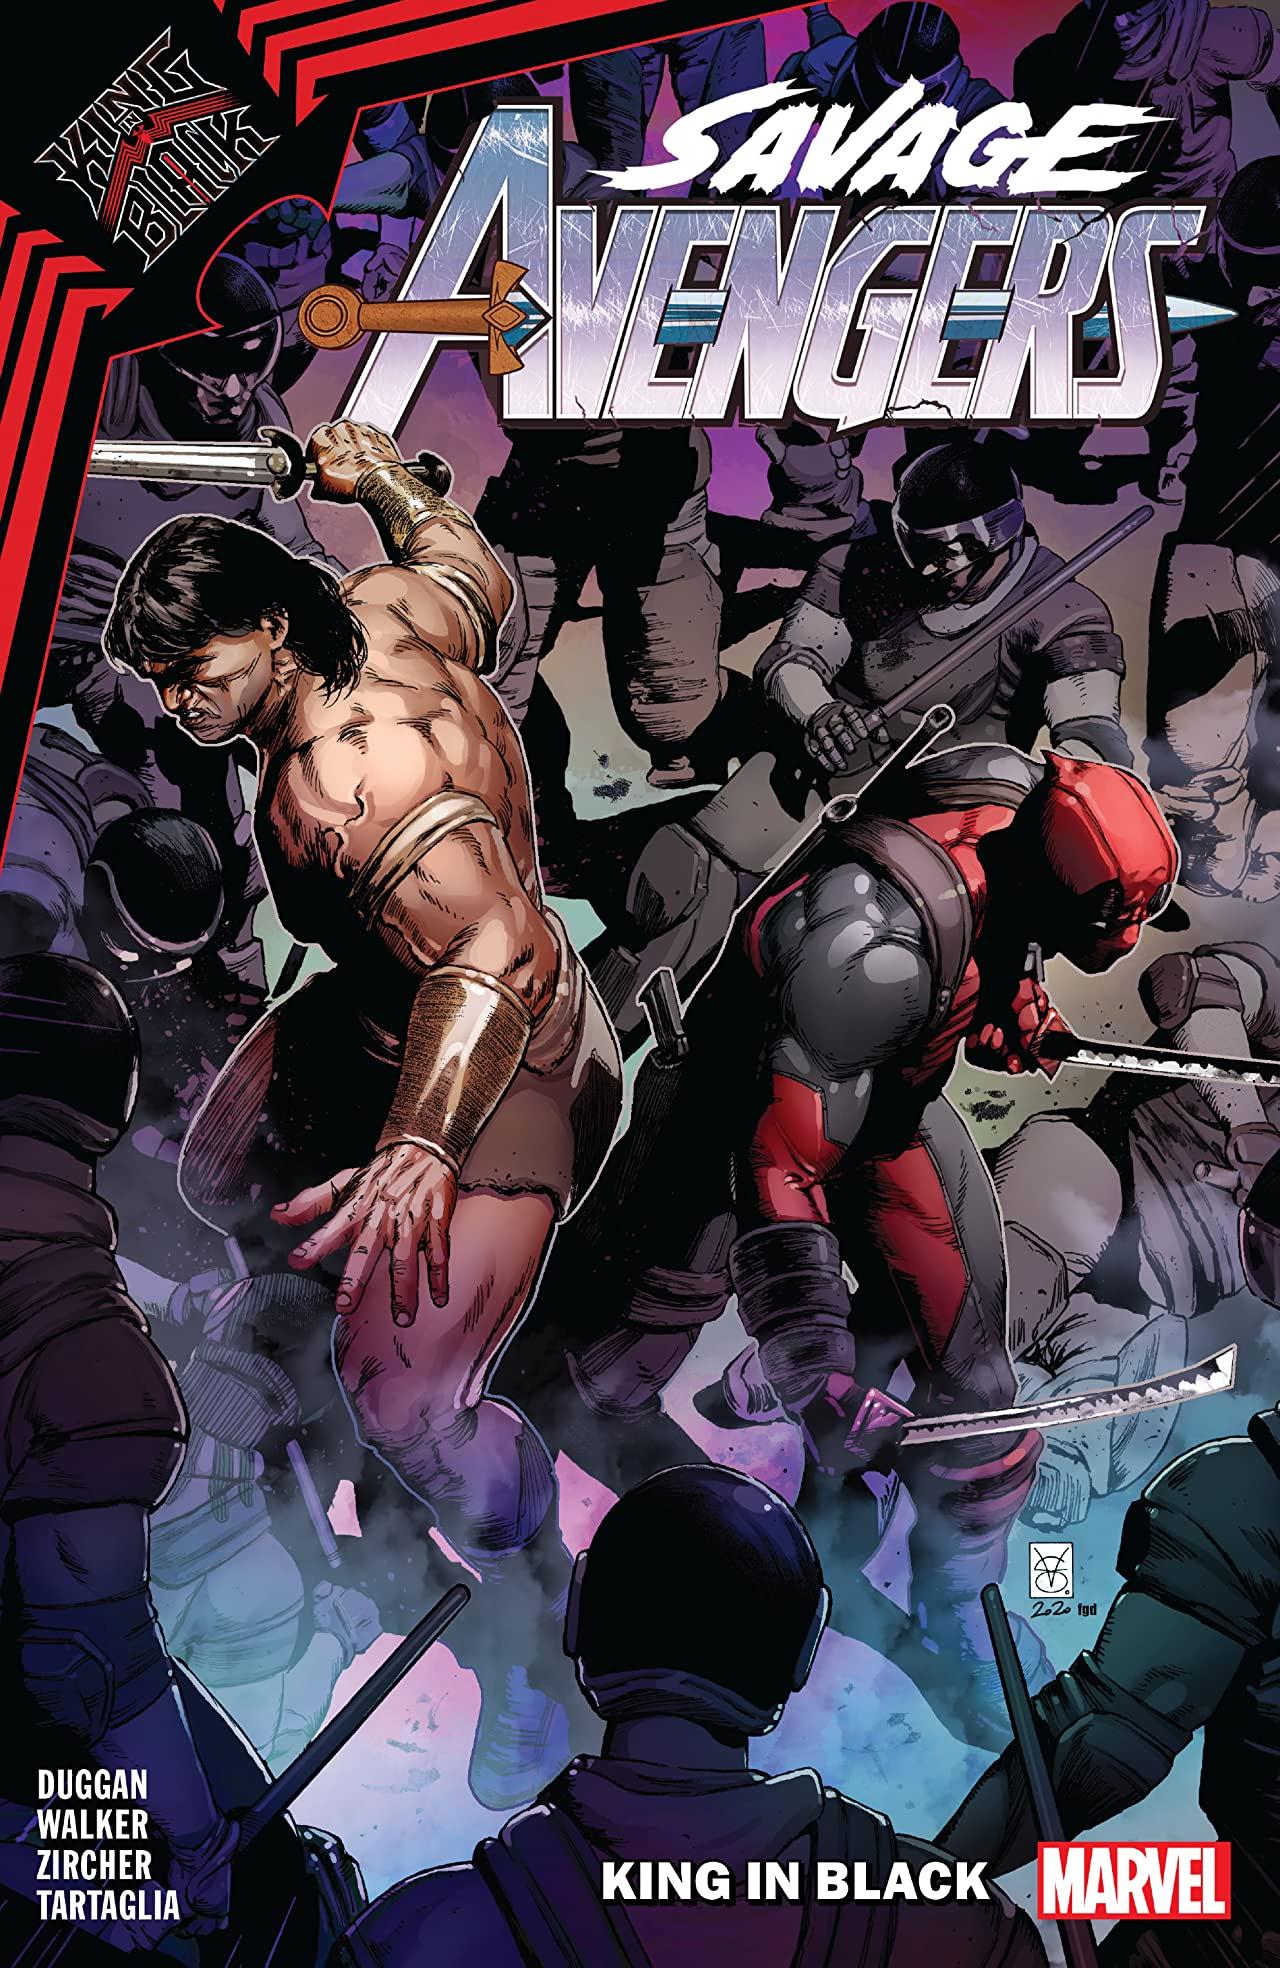 Savage Avengers Vol. 4: King In Black (Trade Paperback)